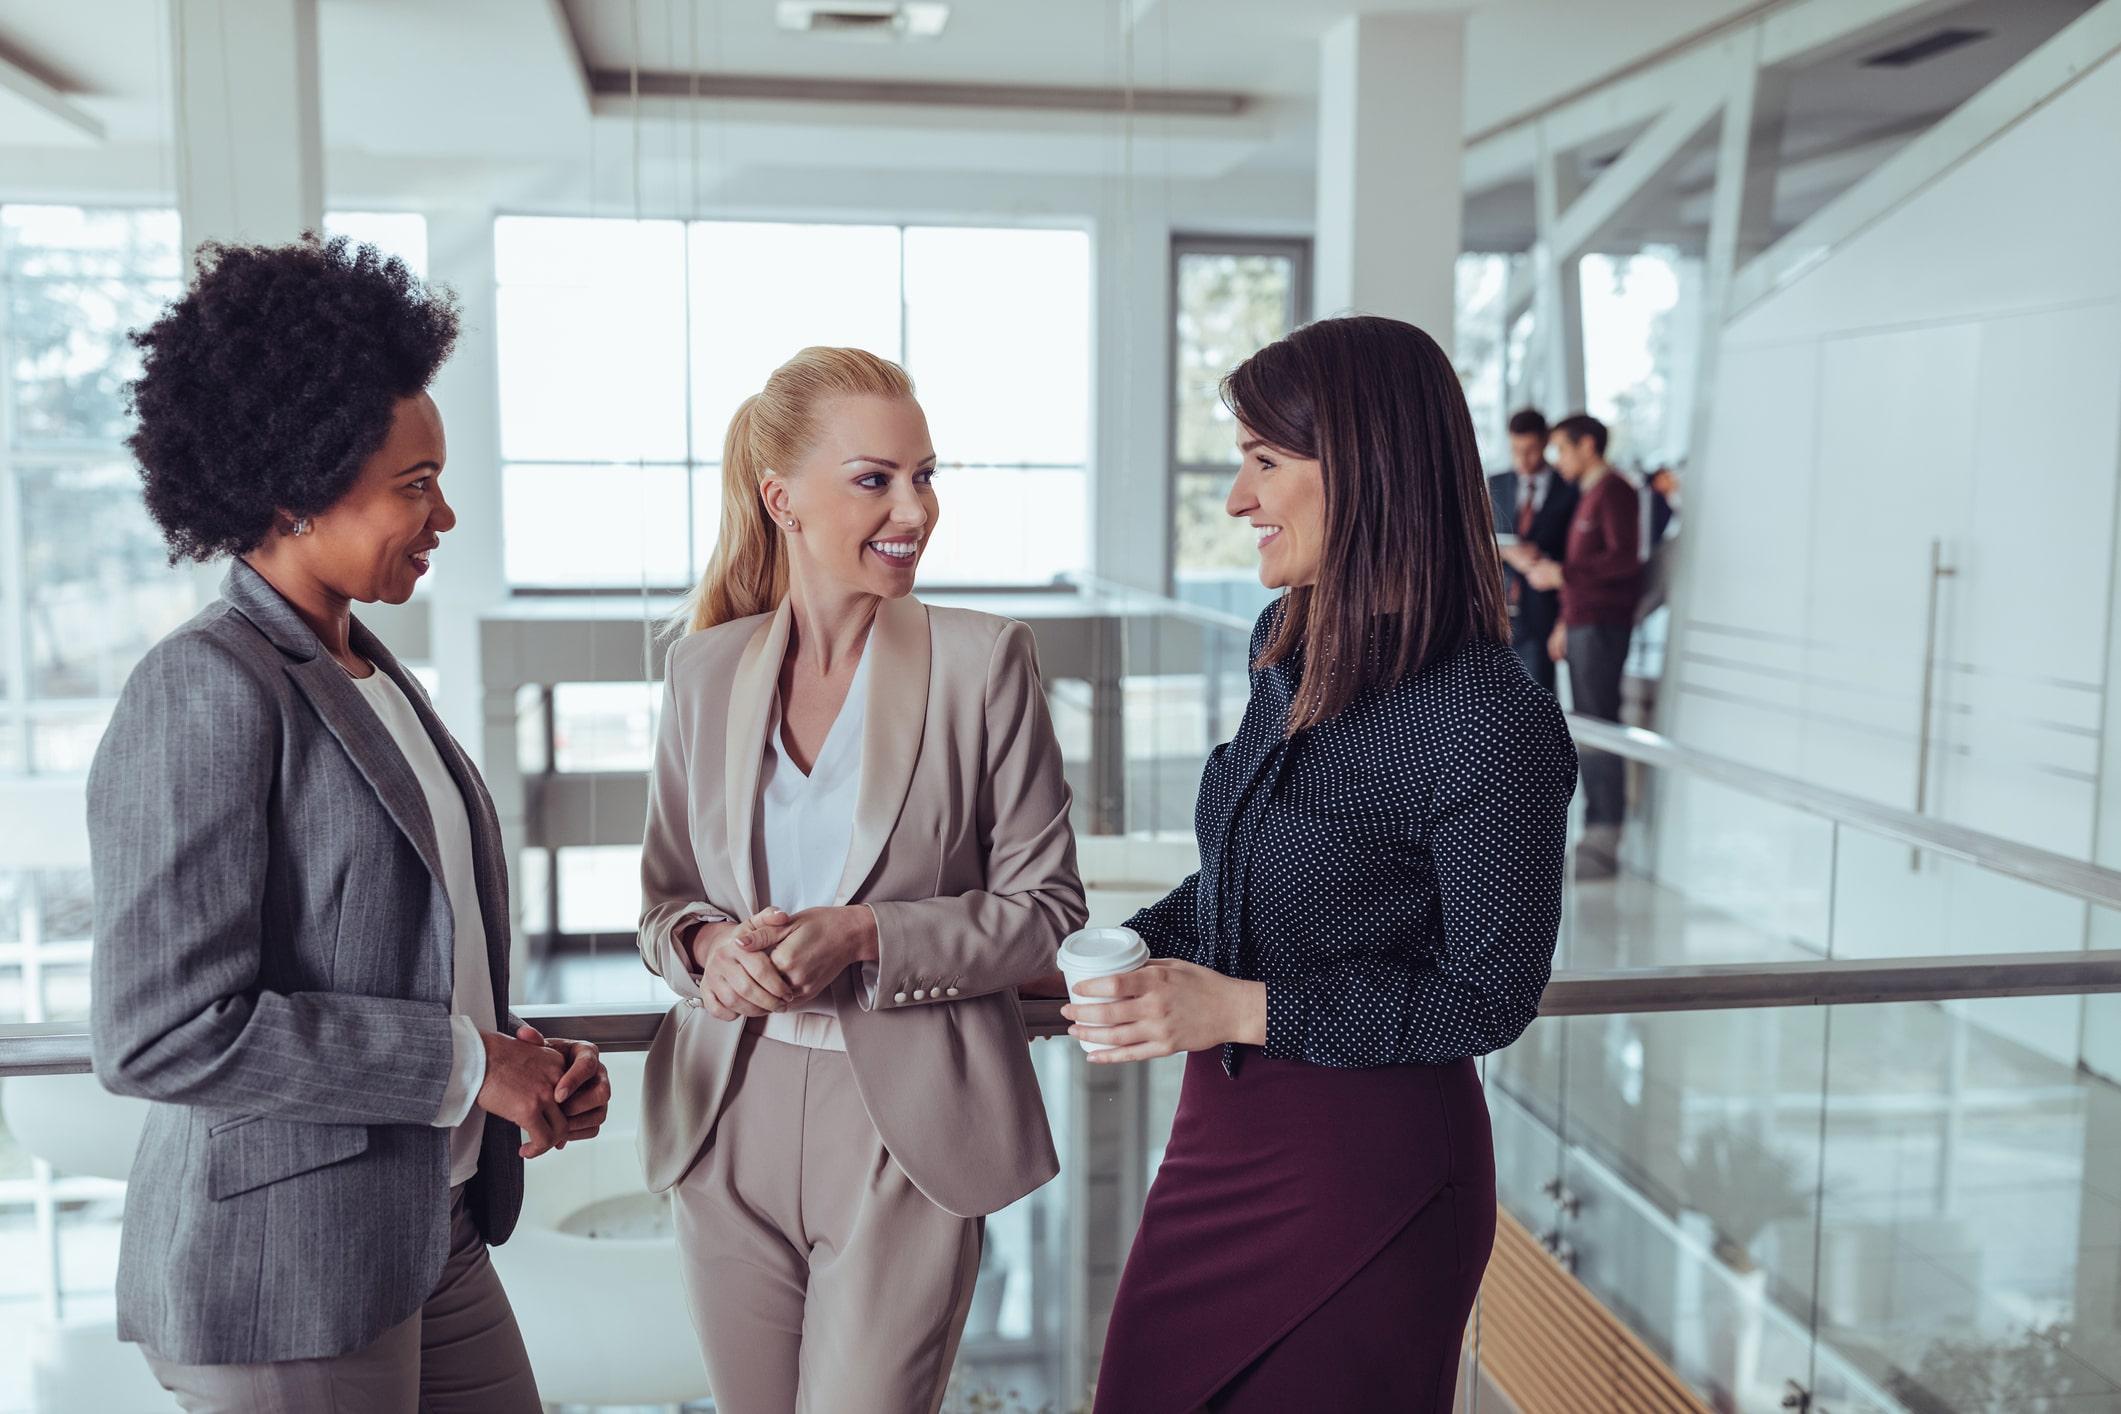 Strategies for women working in international development 74c373c3 a50e 406a 9abf b39f49001650